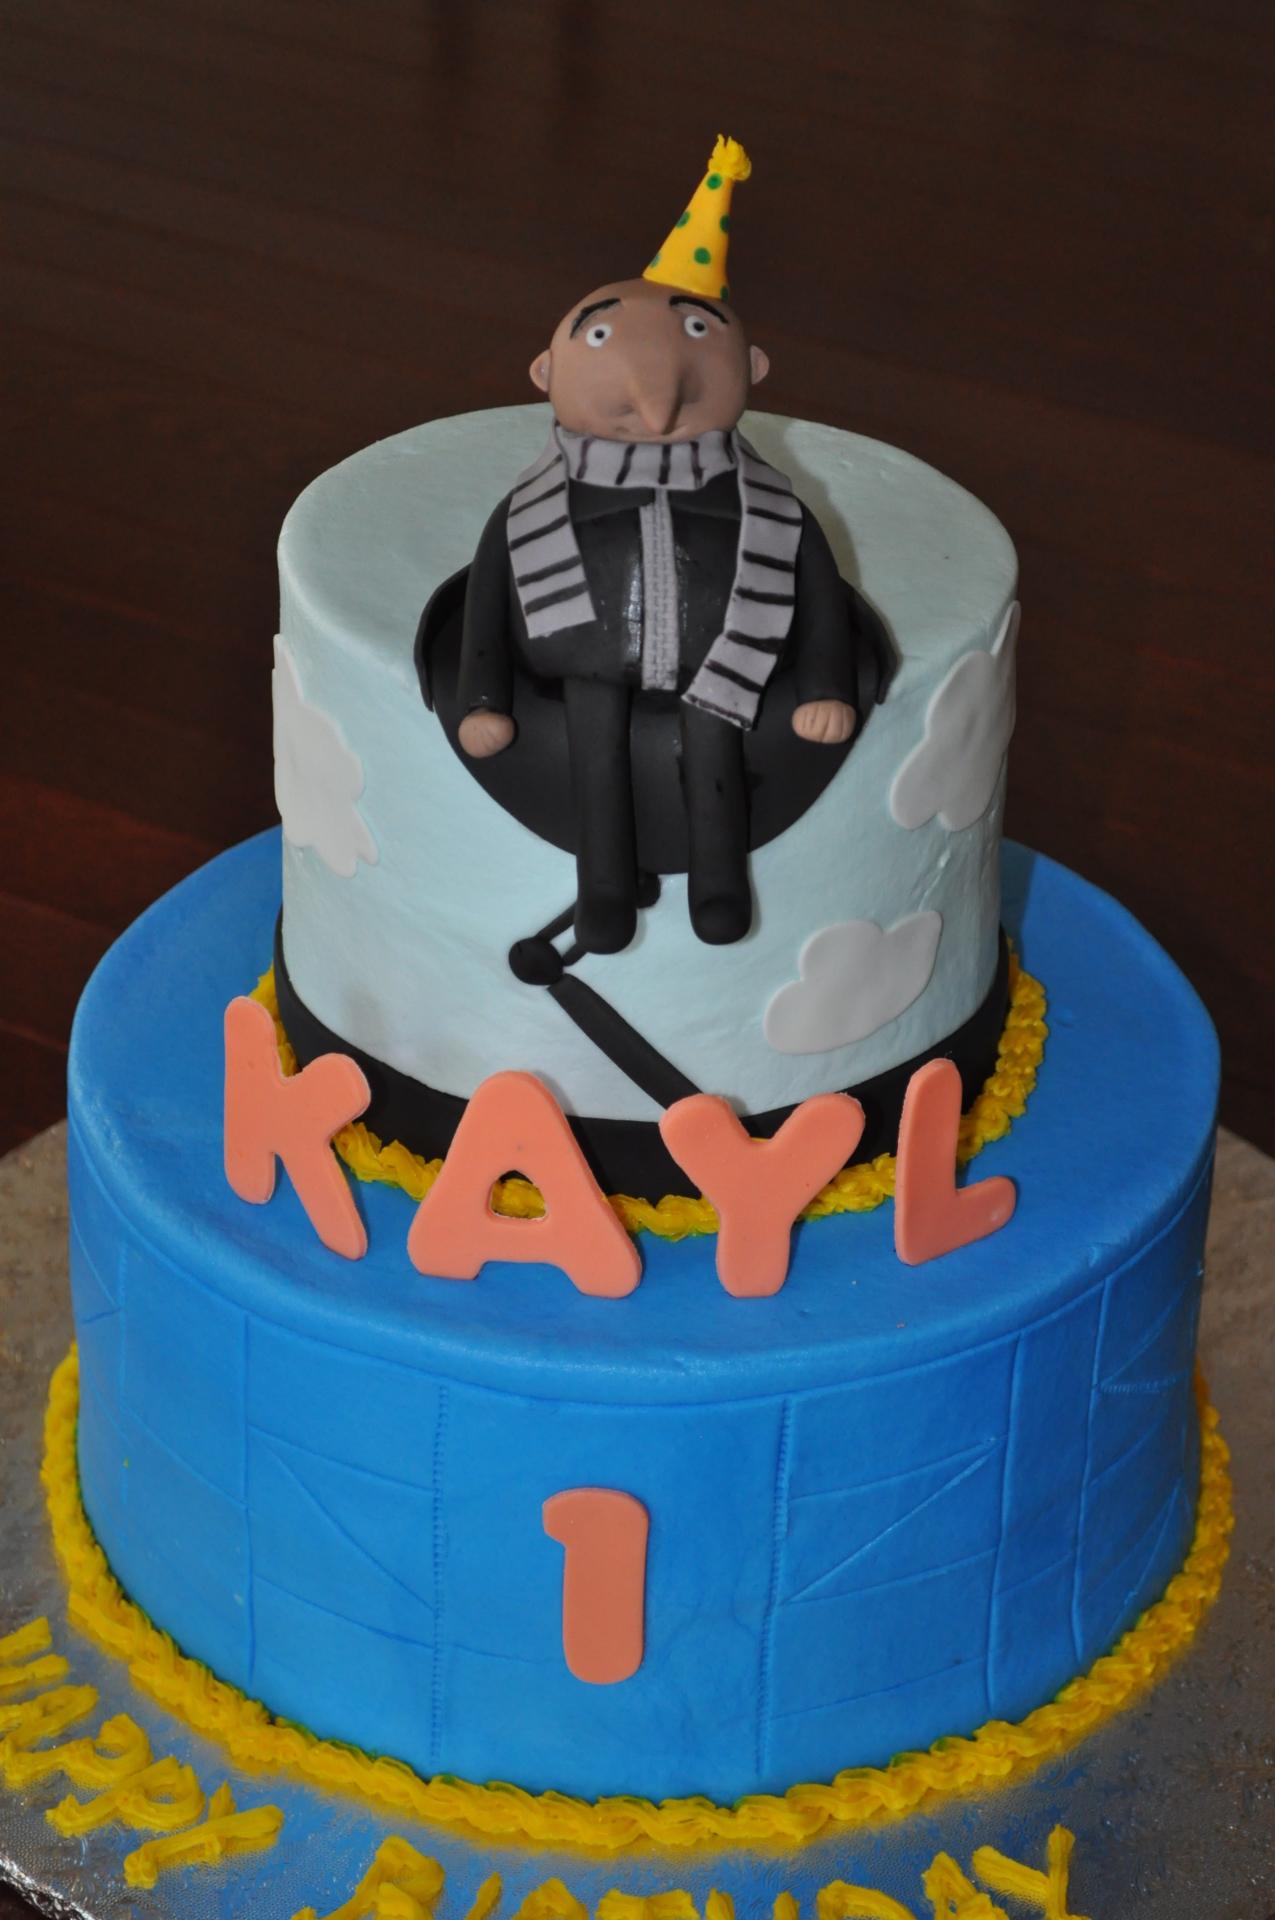 Gru -Despicable me theme cake